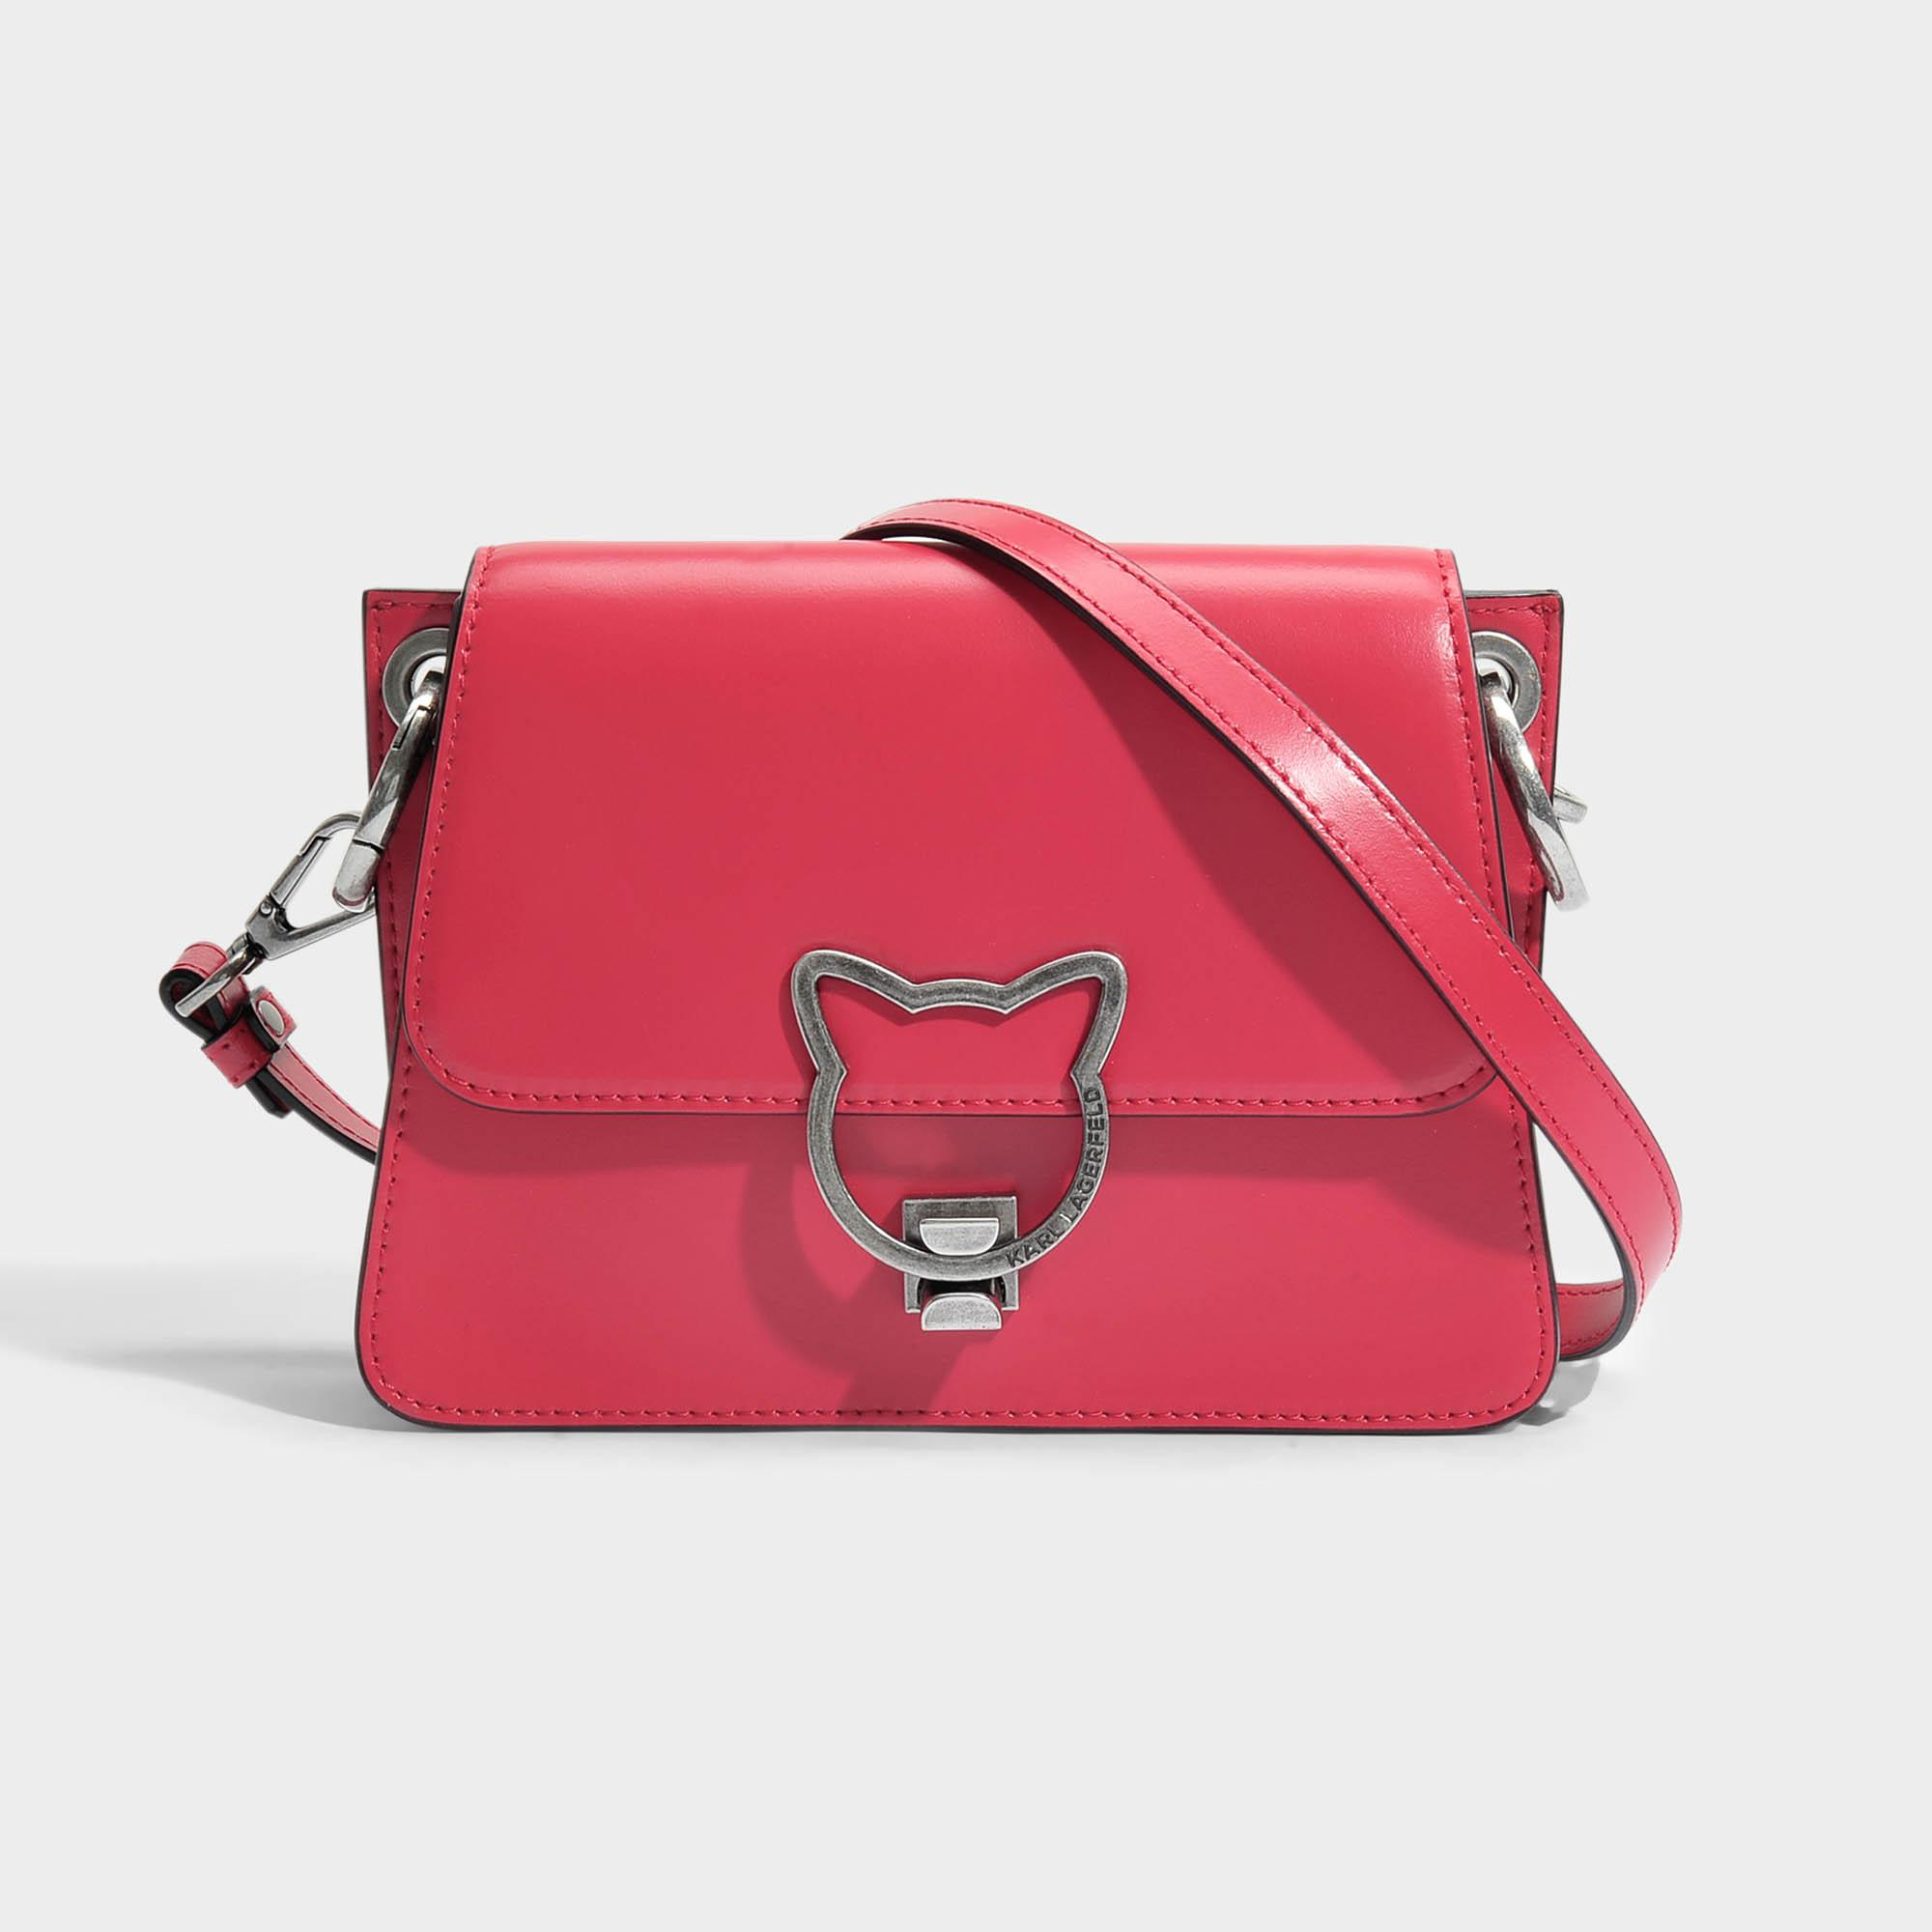 Lyst Karl Lagerfeld Kat Lock Crossbody Bag In Pink